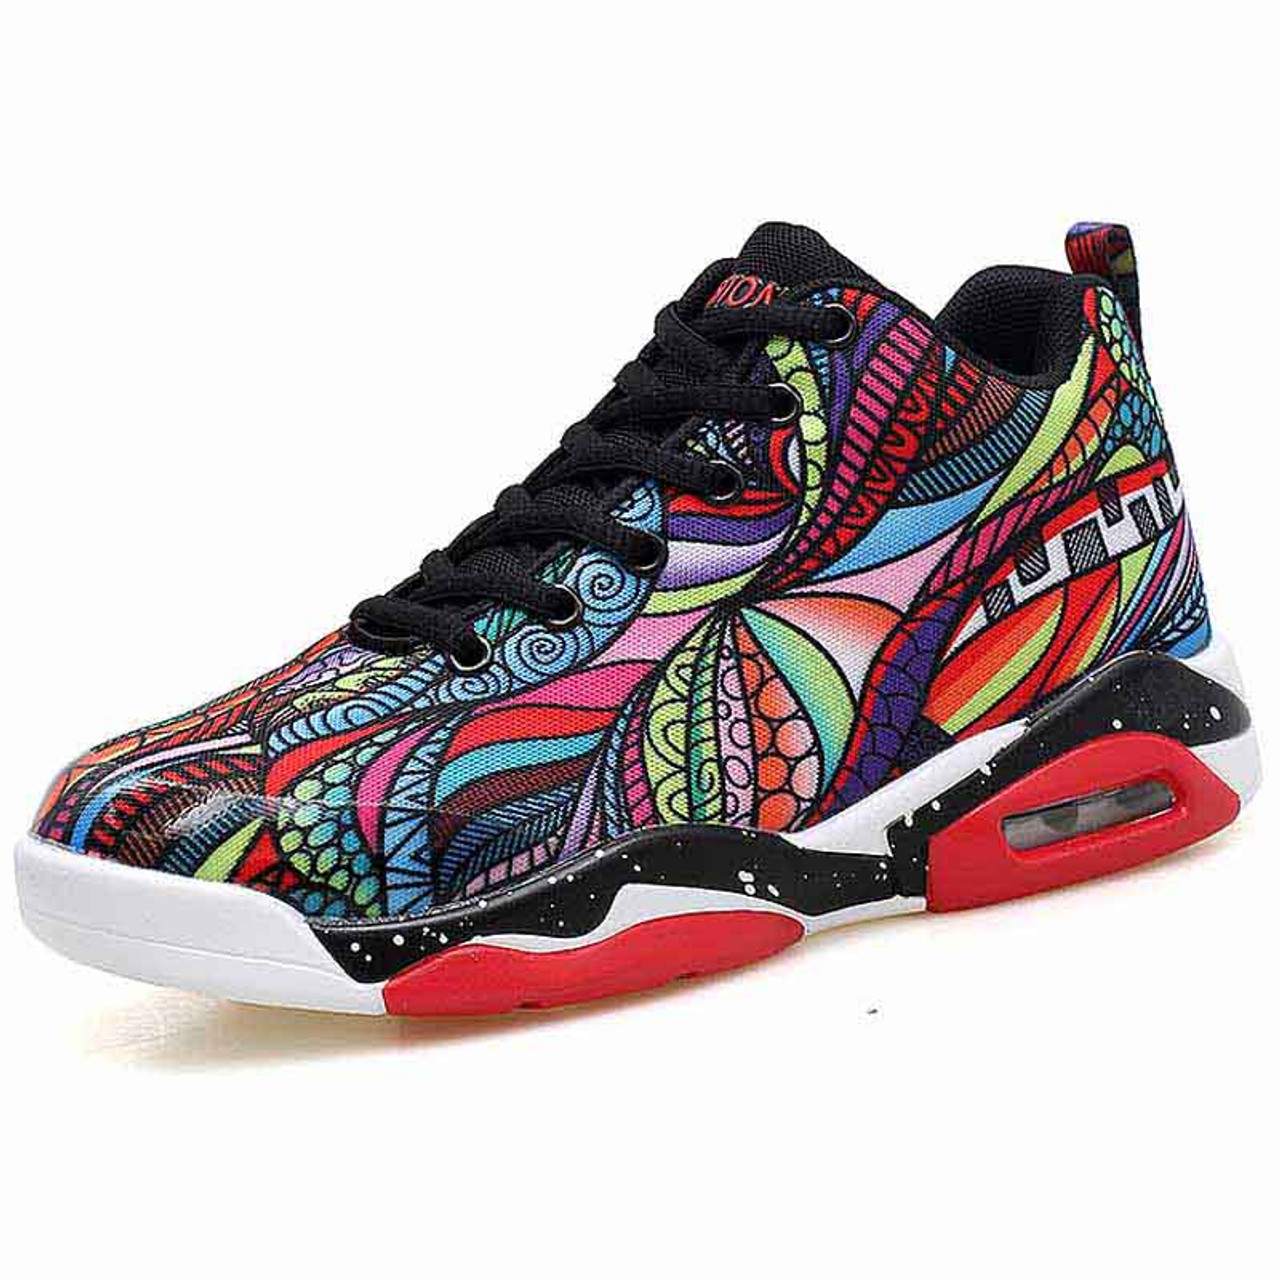 Red color floral pattern sport shoe